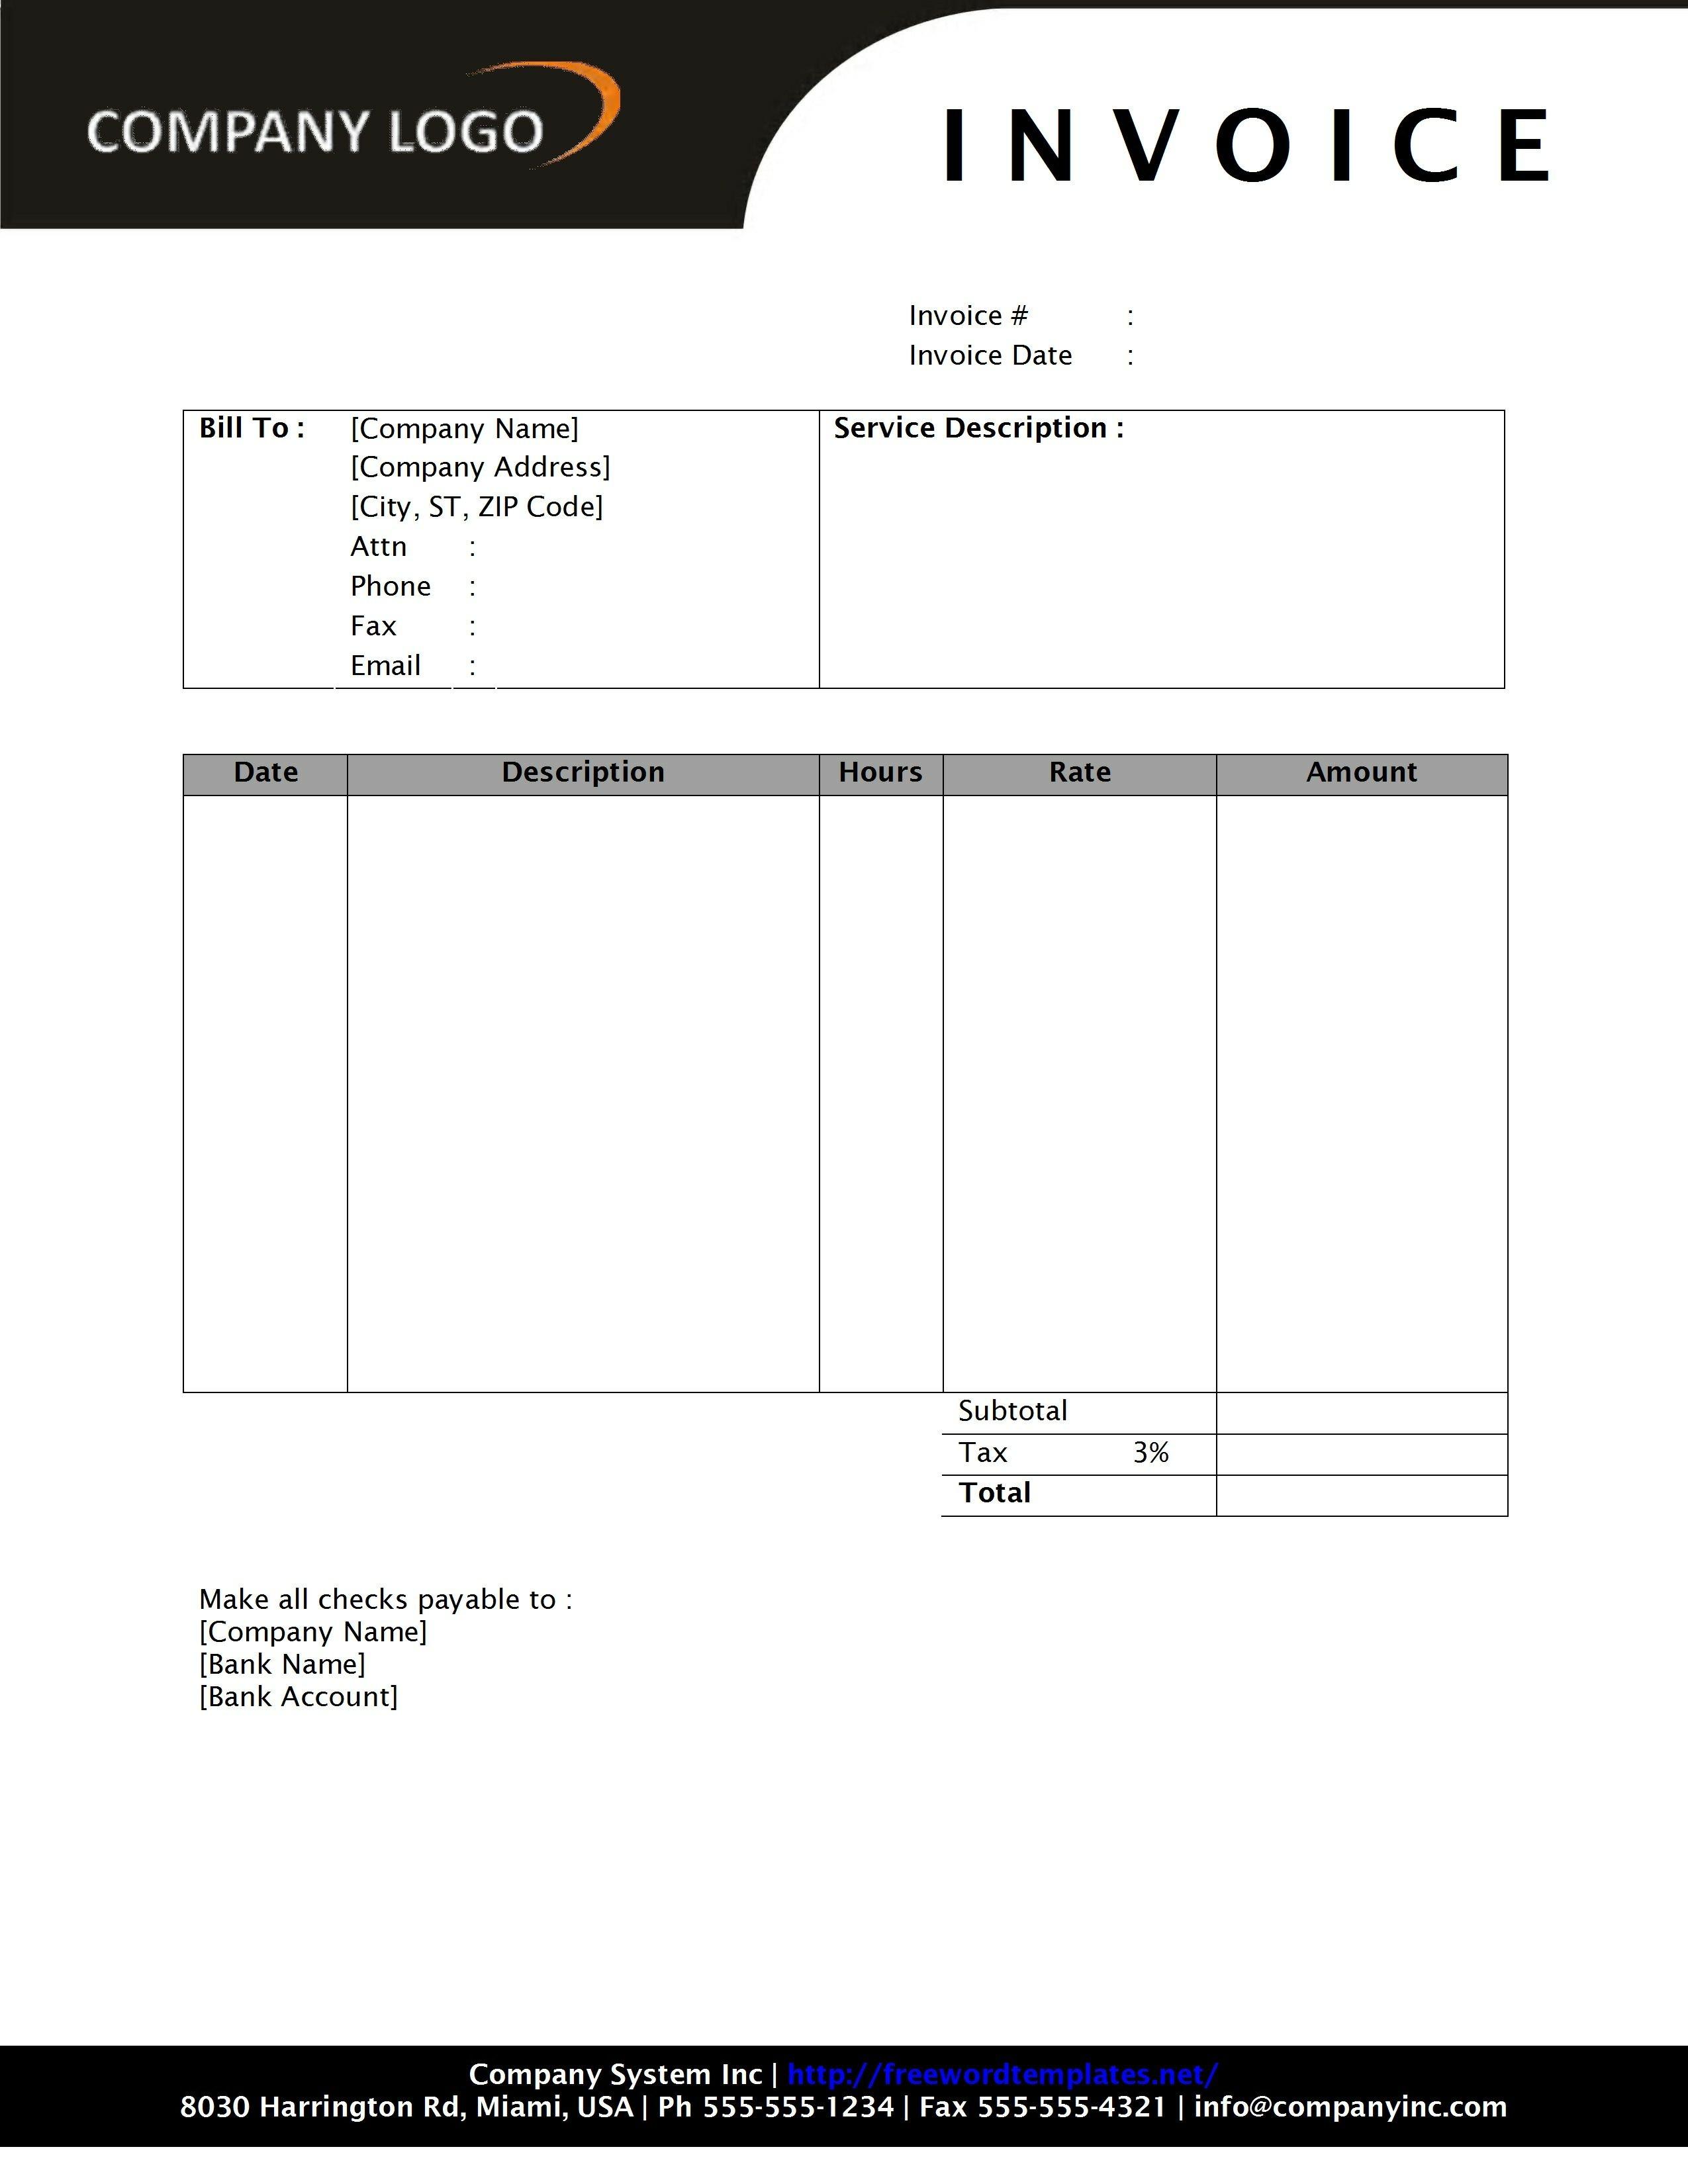 Microsoft Word Invoice Template Free Download microsoft income ...